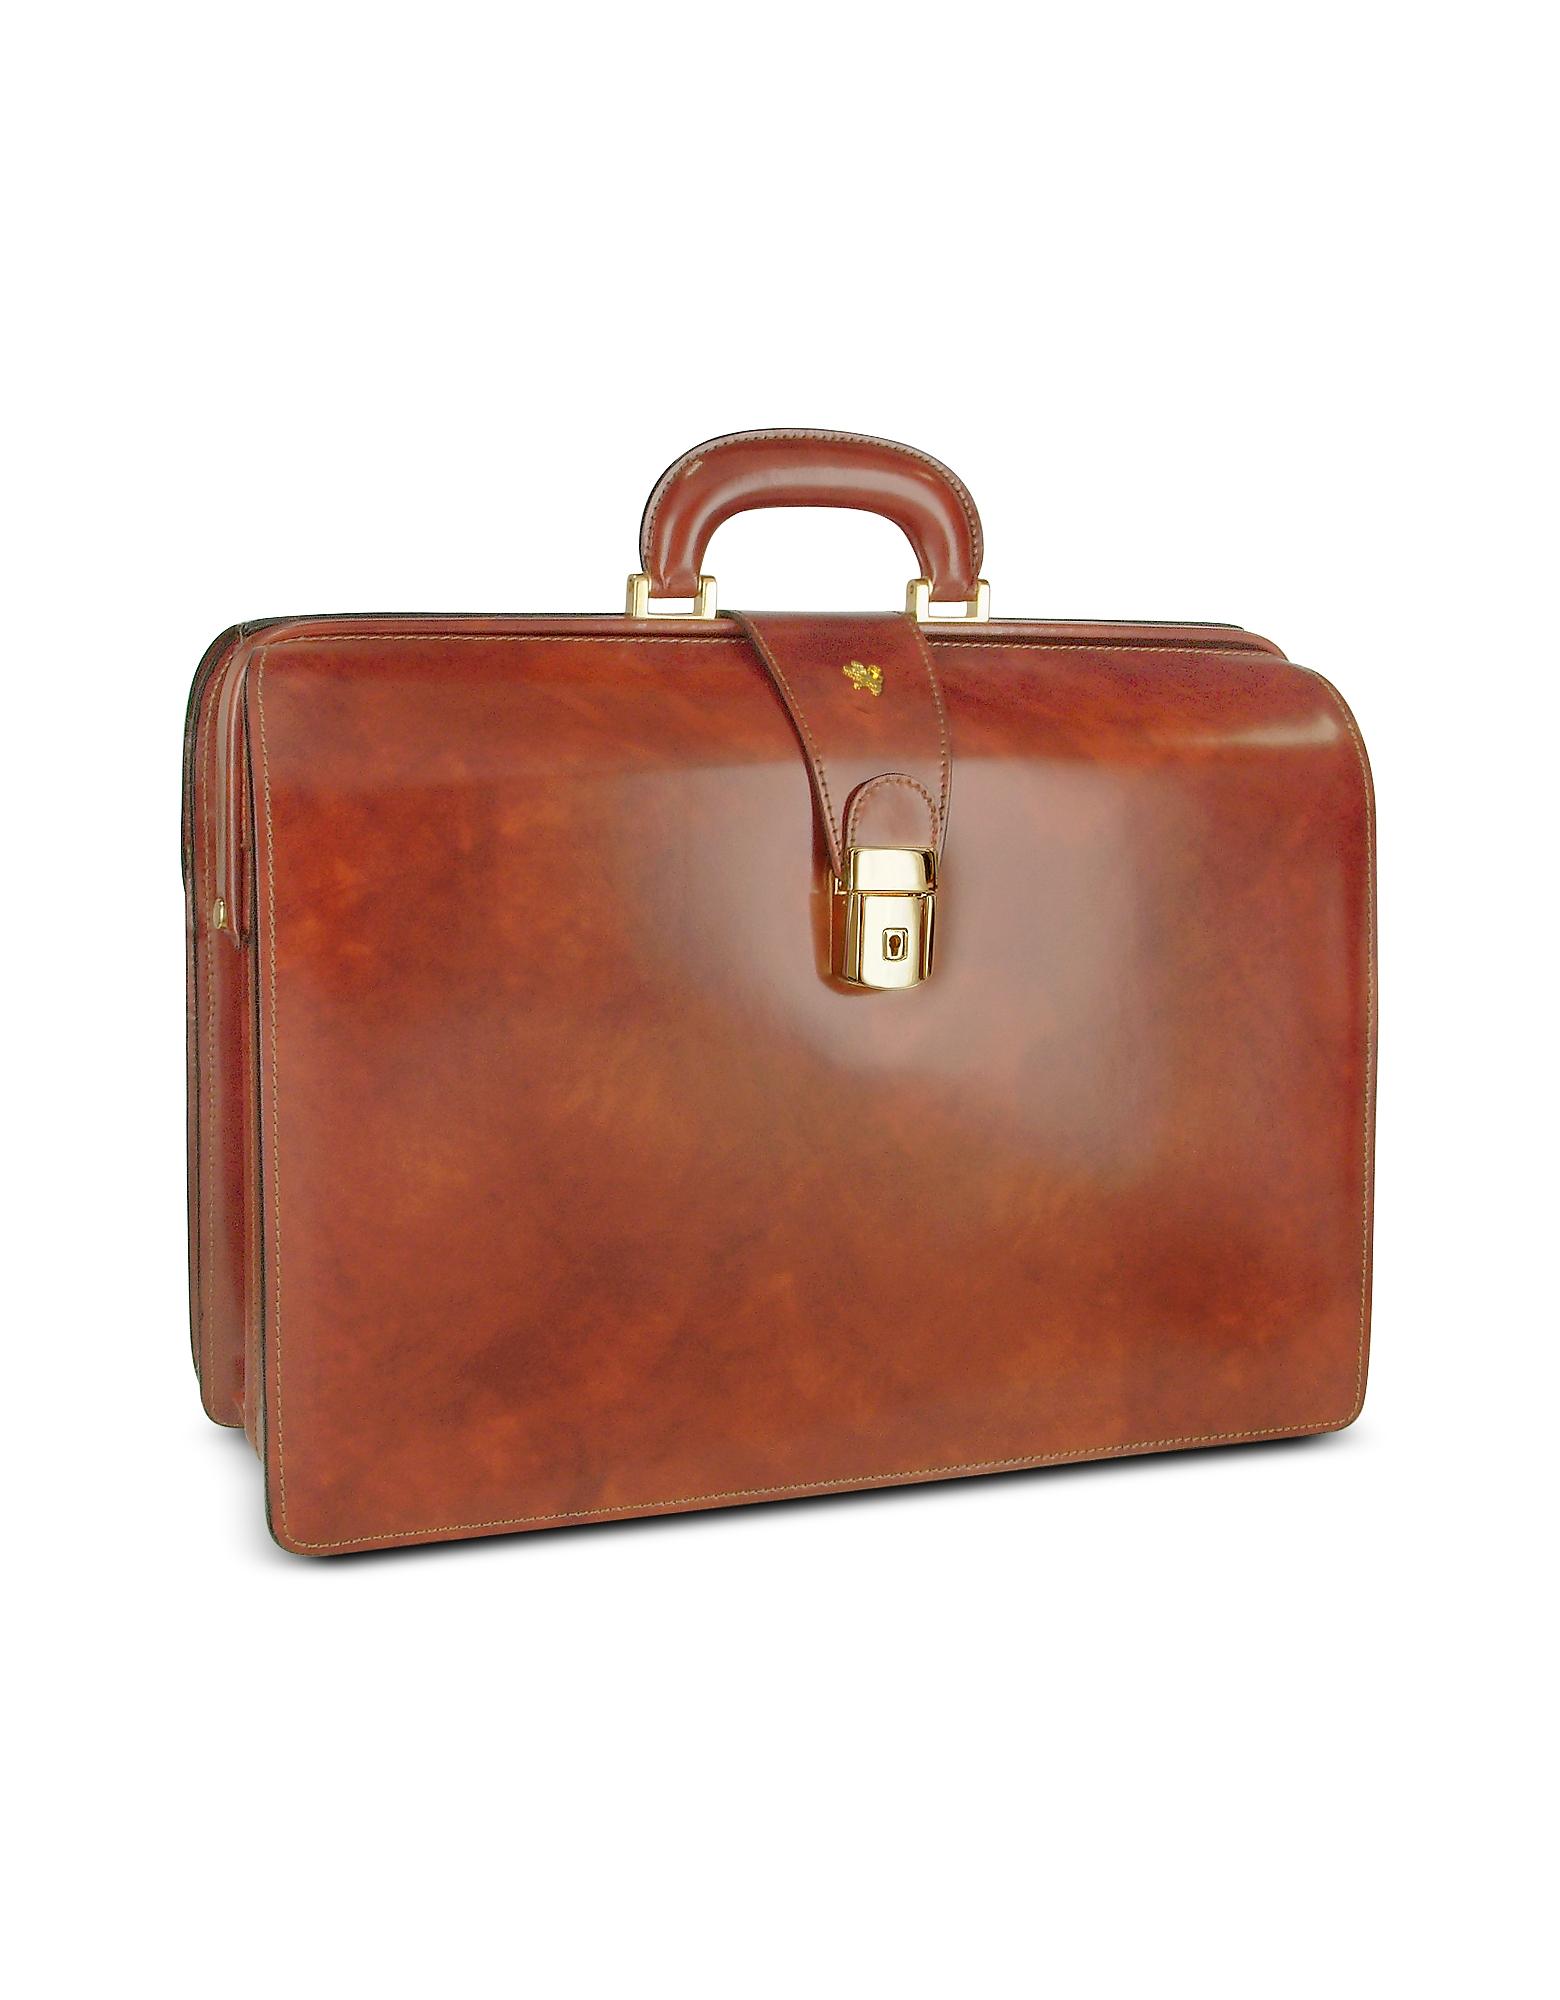 Pratesi Designer Travel Bags, Men's Leather Doctor Bag Briefcase